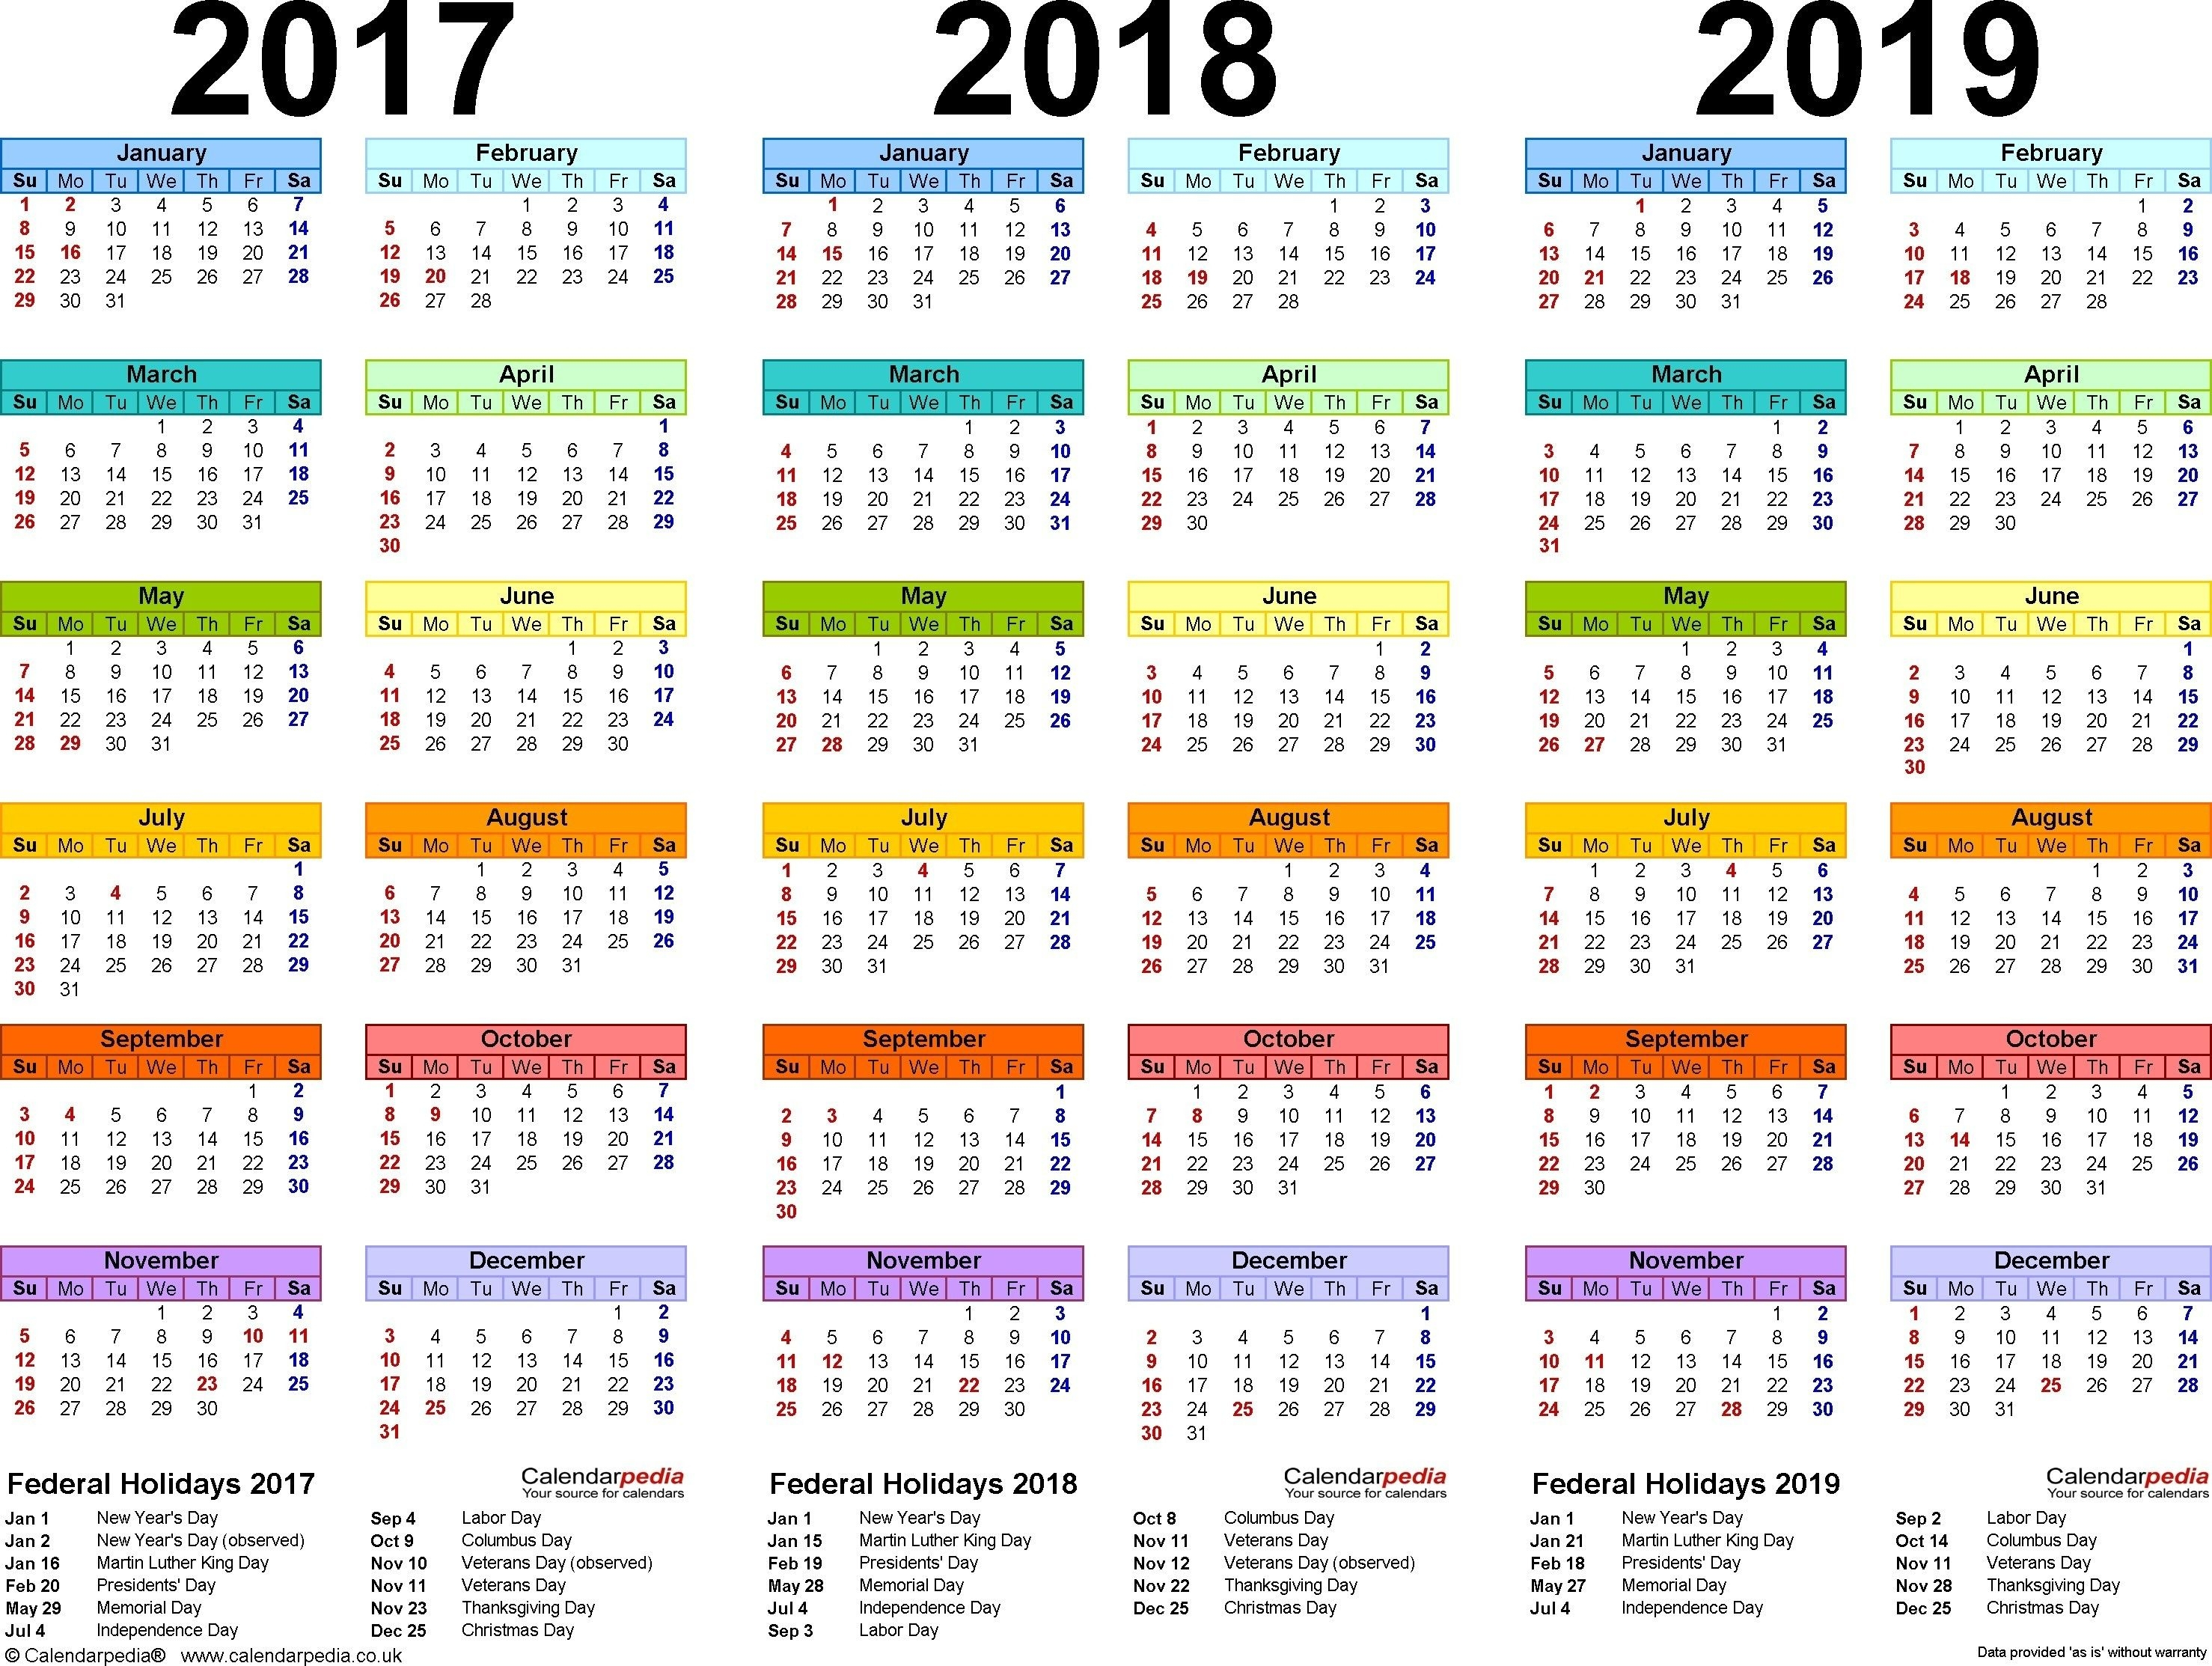 Depo Provera Printable Calendar 2019 August   Calendar